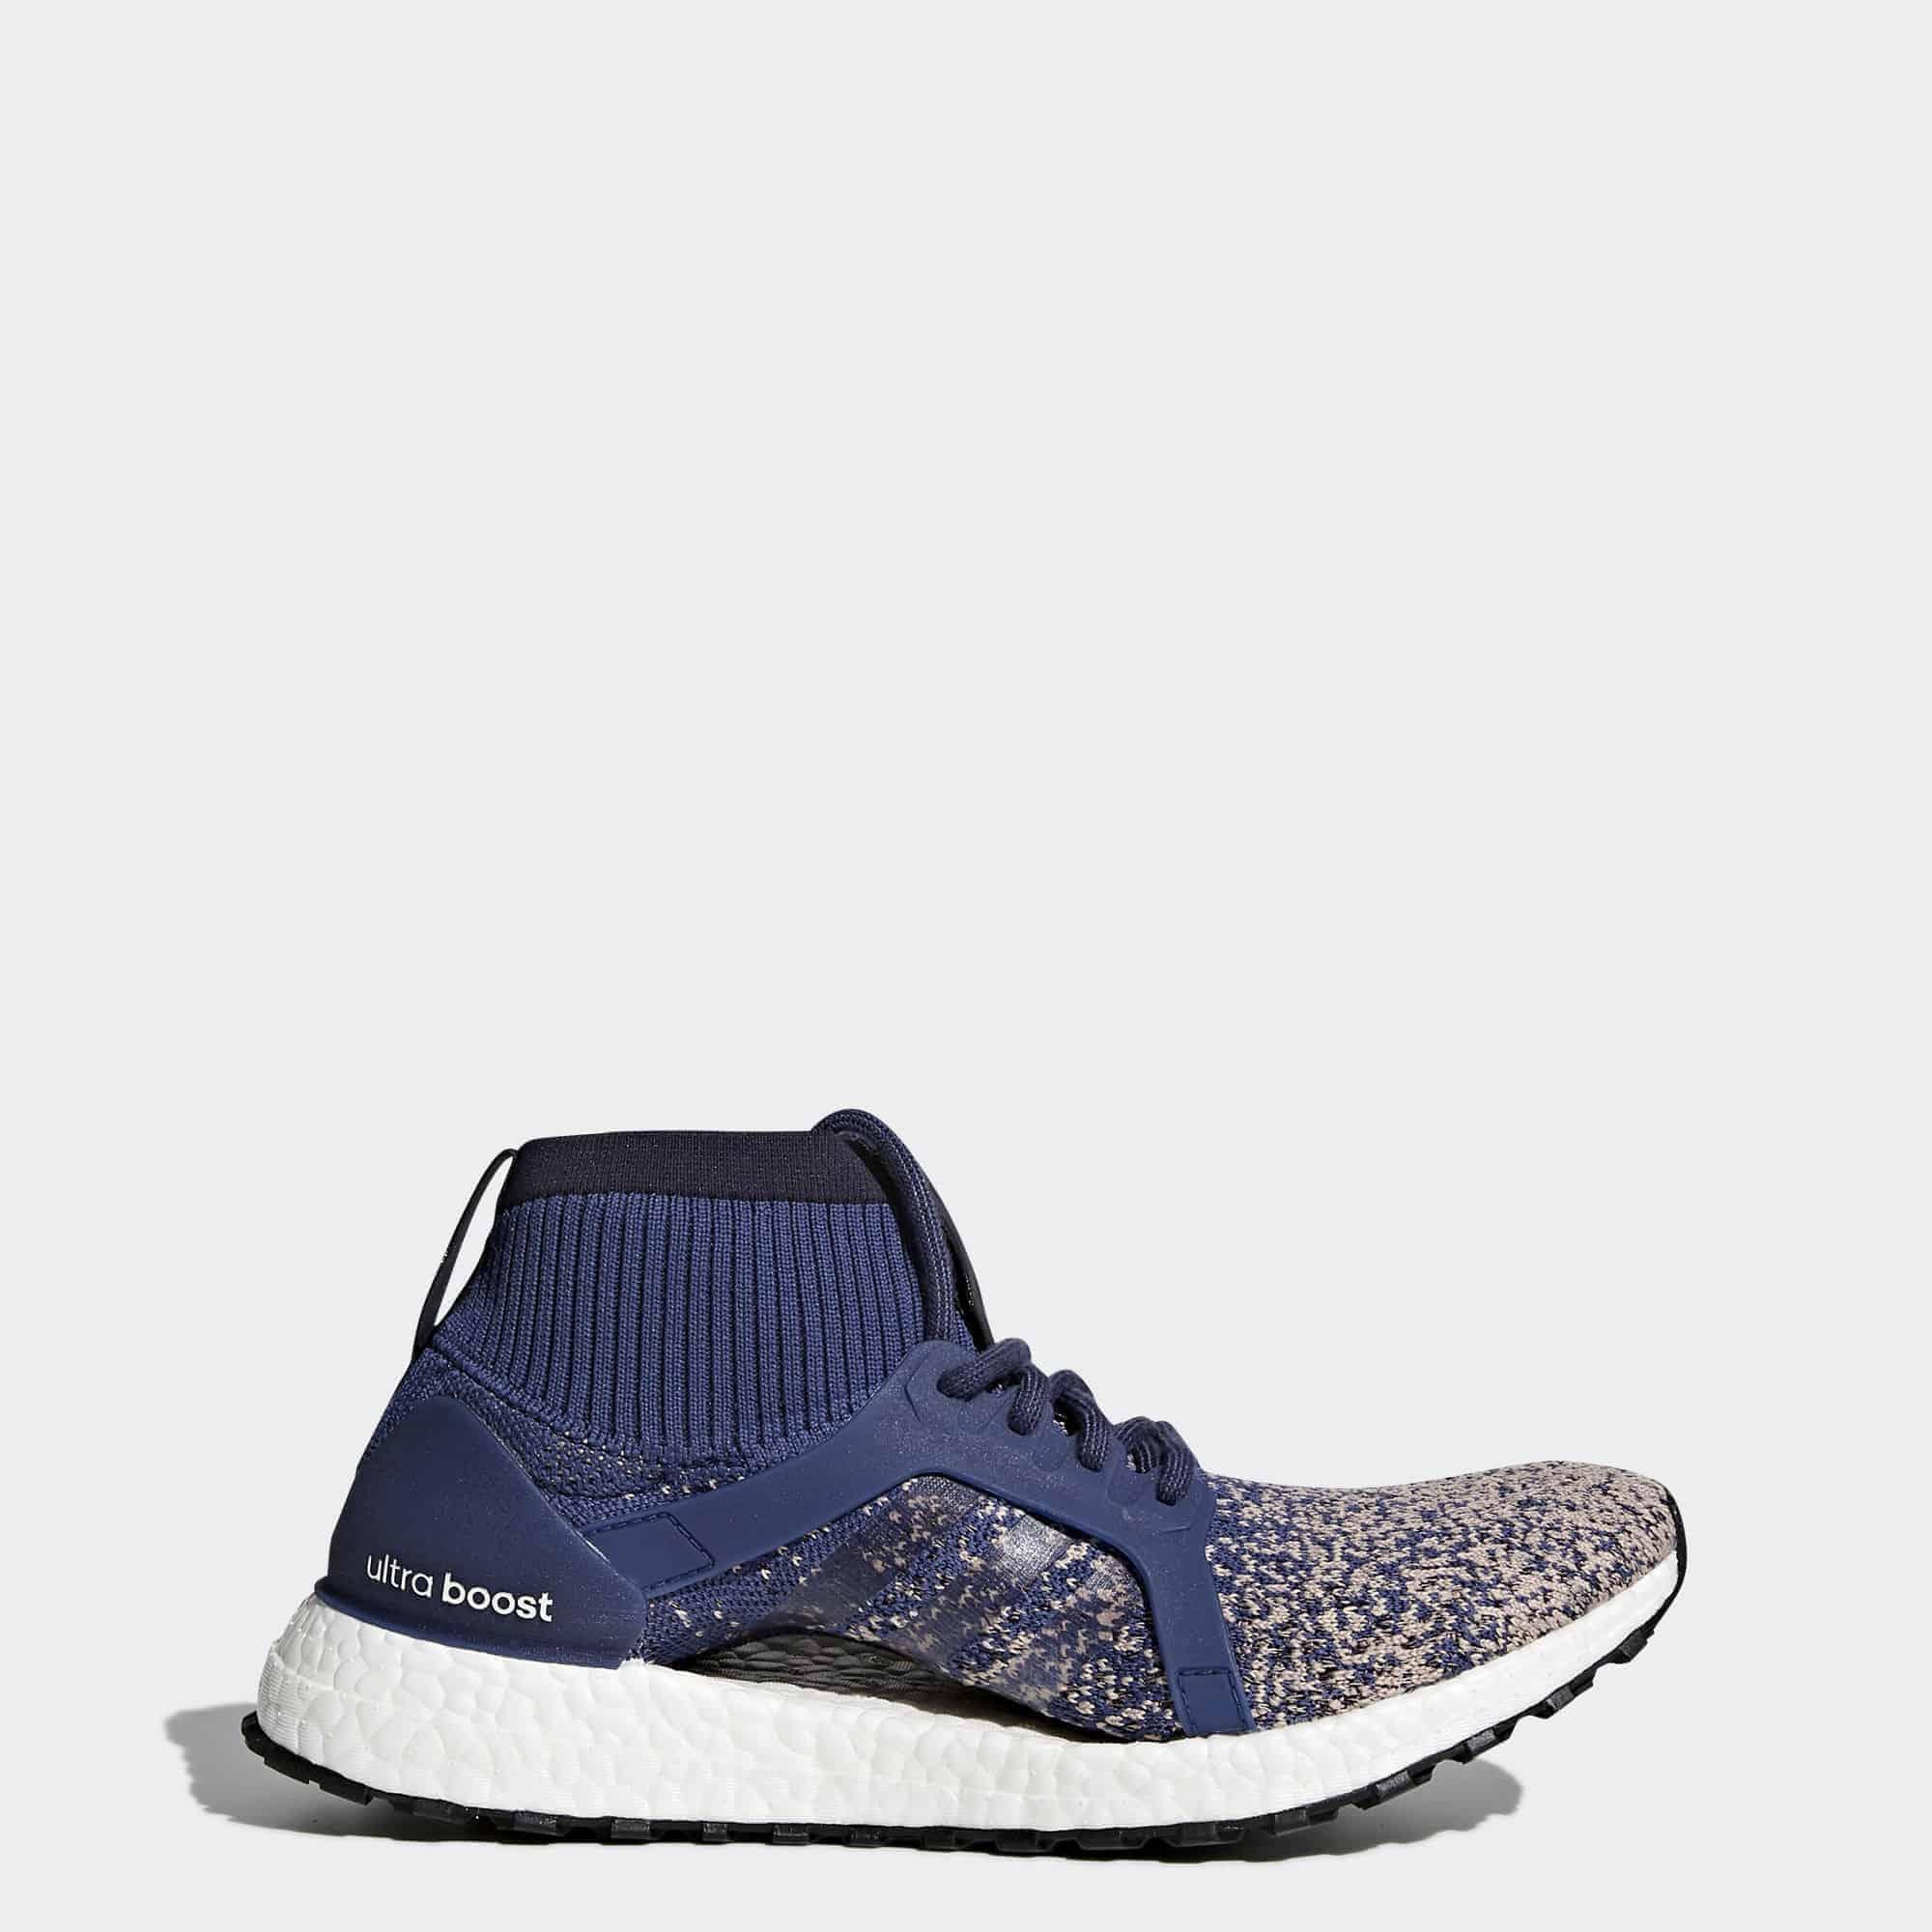 Кроссовки для бега Adidas Ultraboost X All Terrain женские